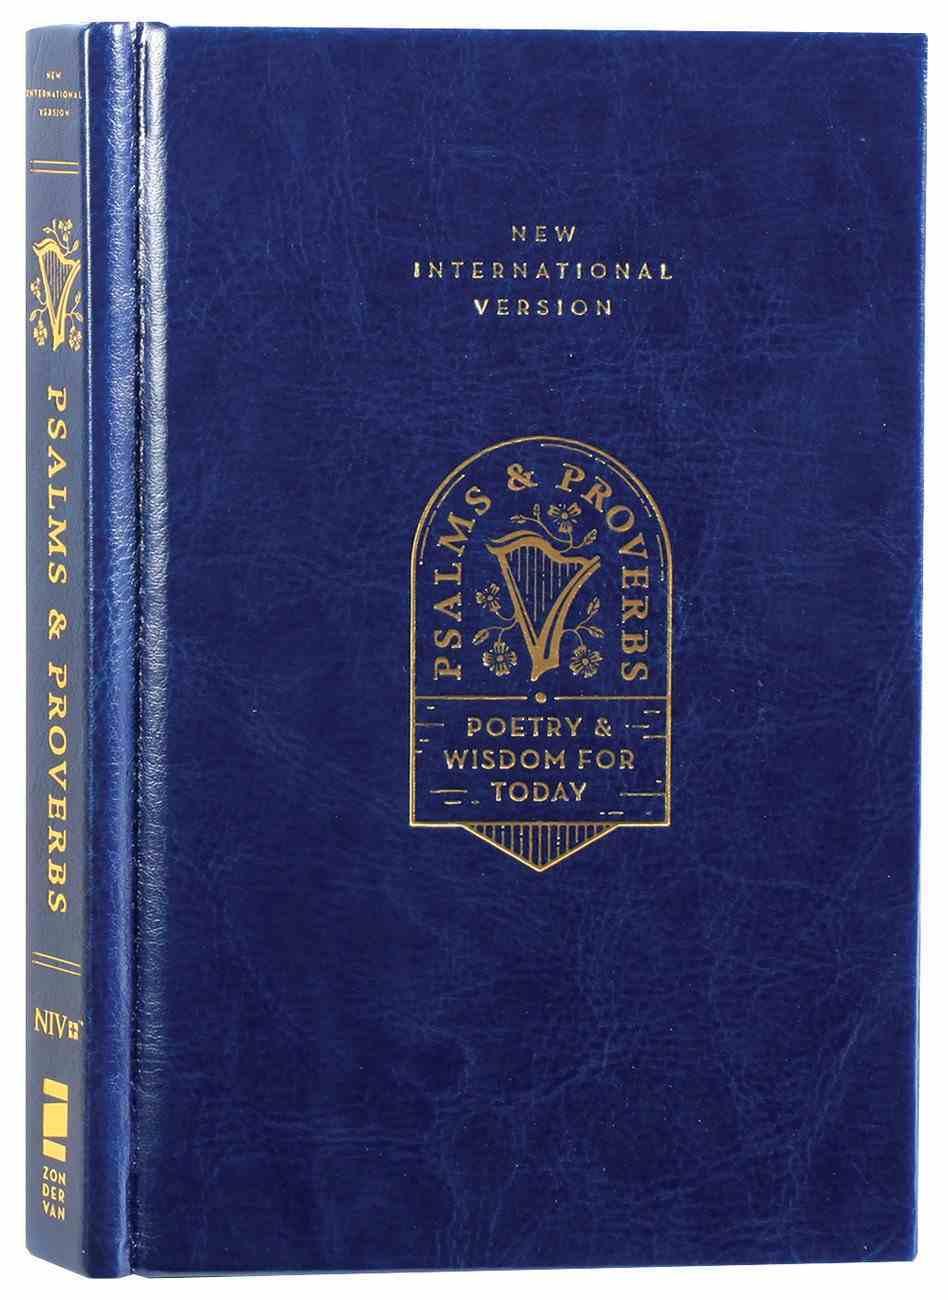 NIV Psalms and Proverbs Navy Hardback